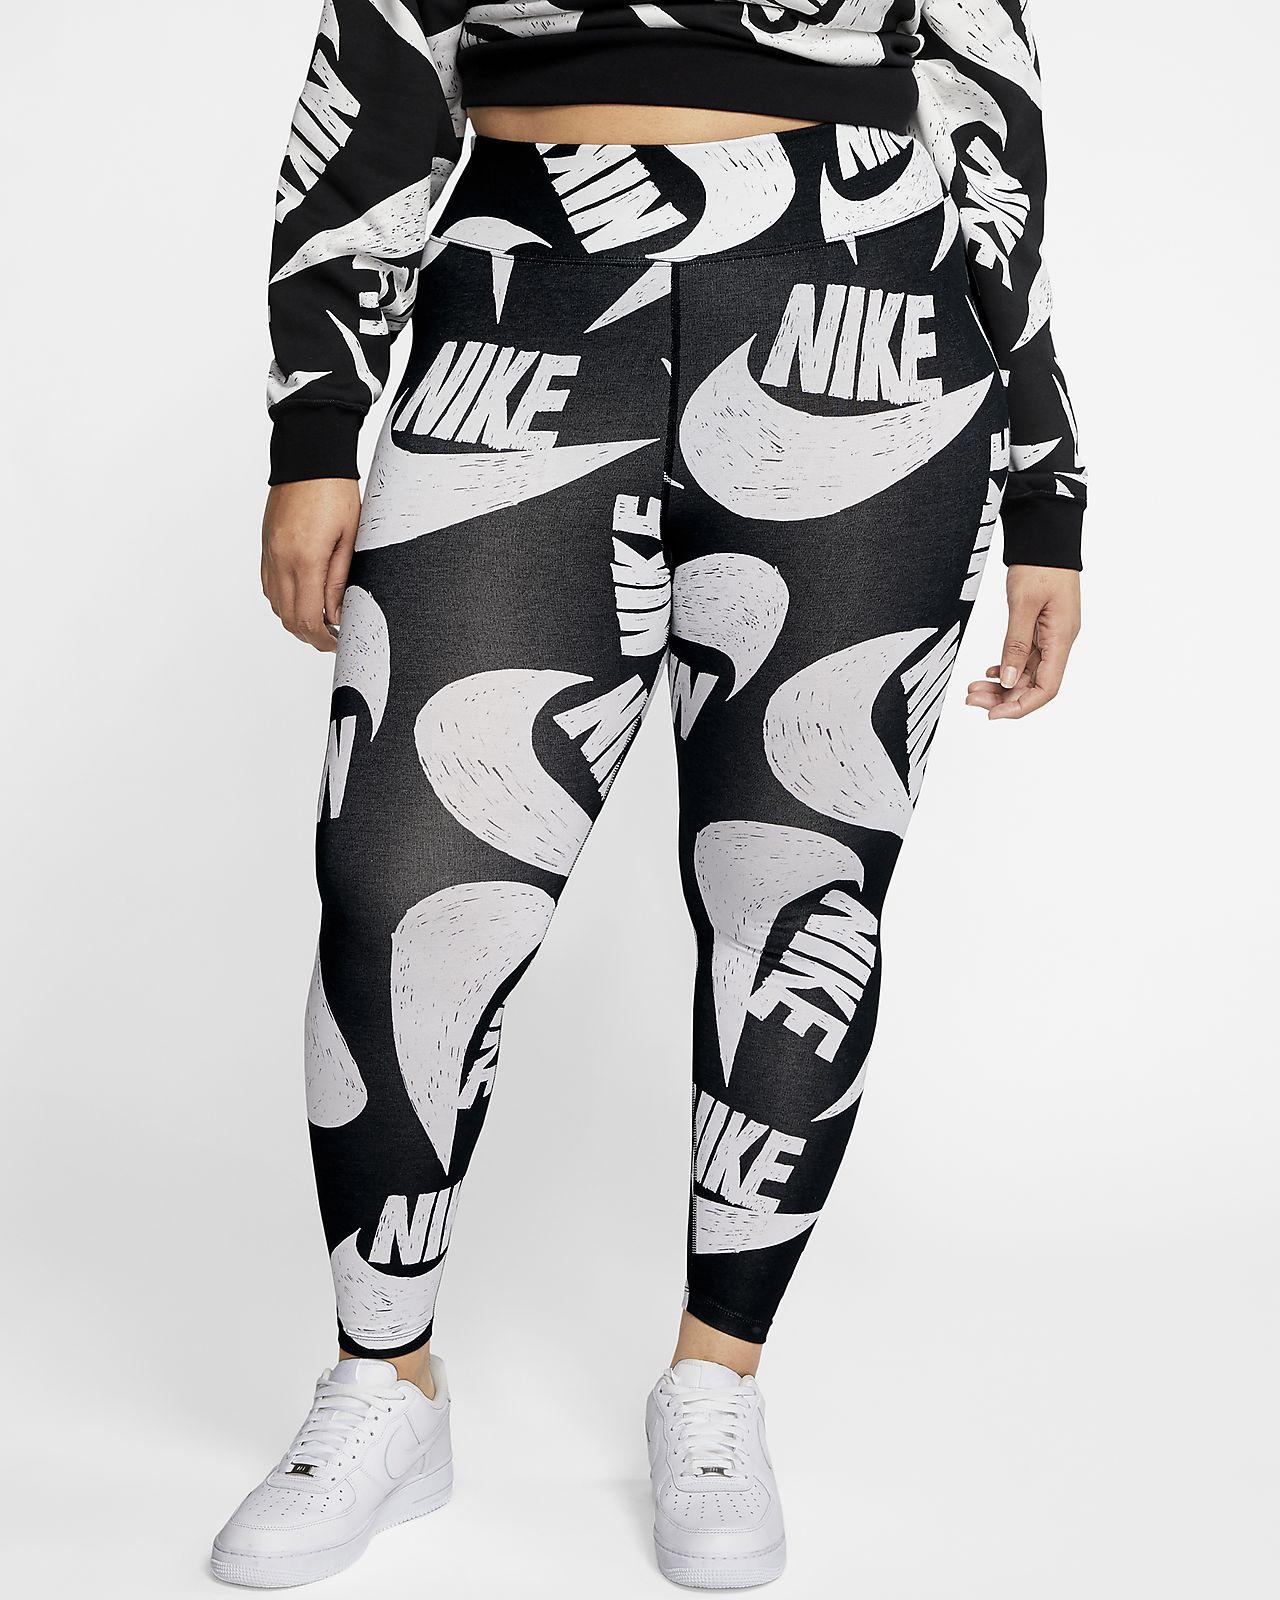 Nike Sportswear Icon Clash Legging met print voor dames (grote maten)